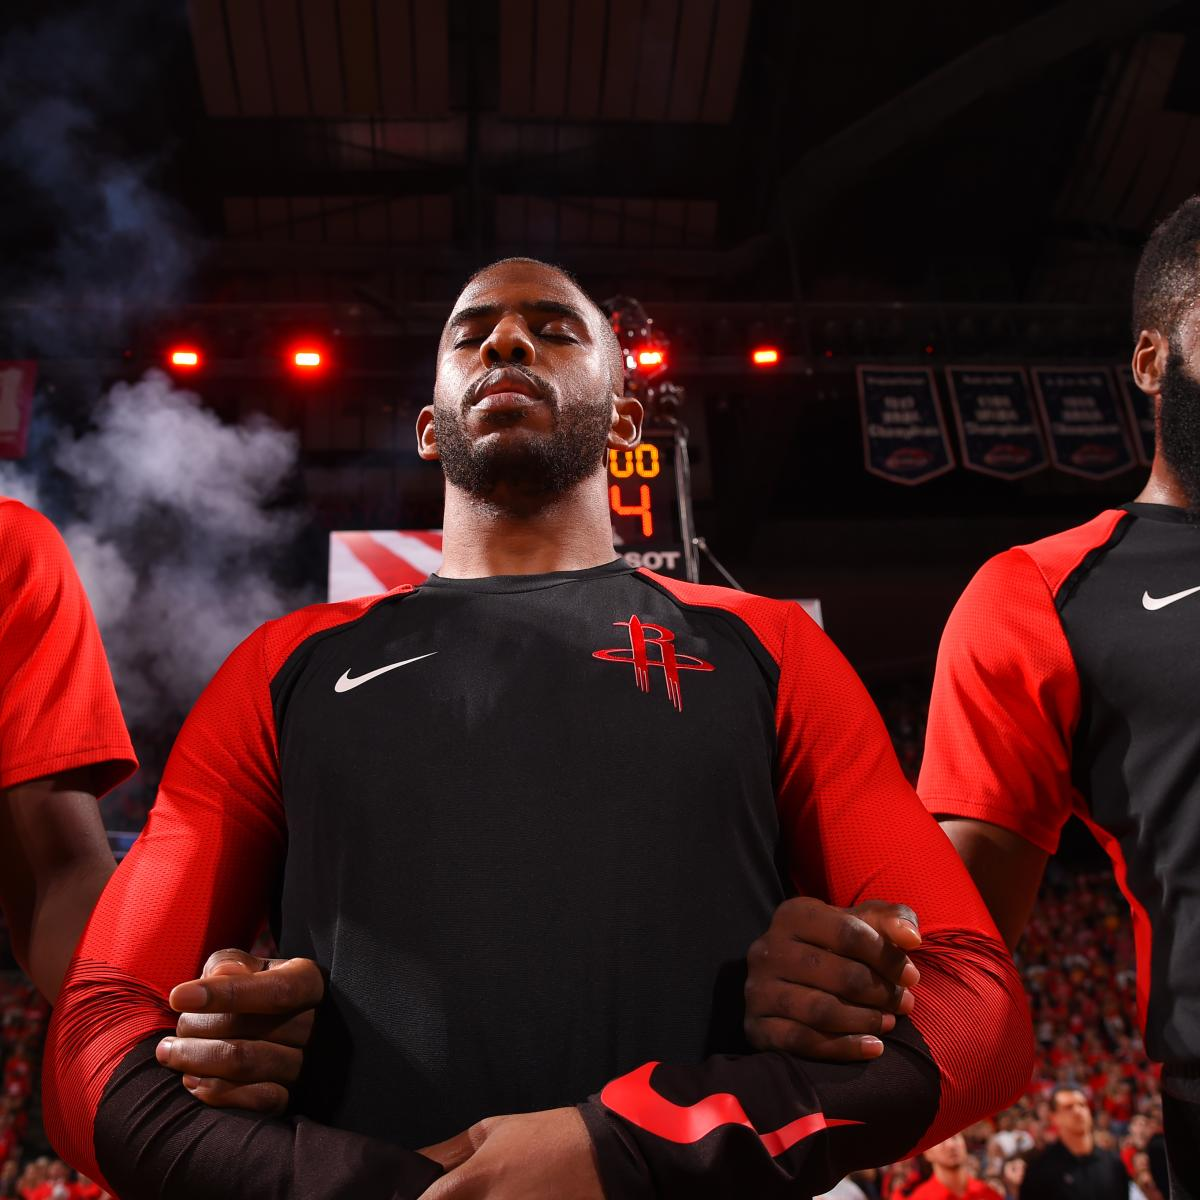 Golden State Warriors Vs Houston Rockets Live Stream Game 6: Look: Rockets Fan Skips College Graduation To Attend